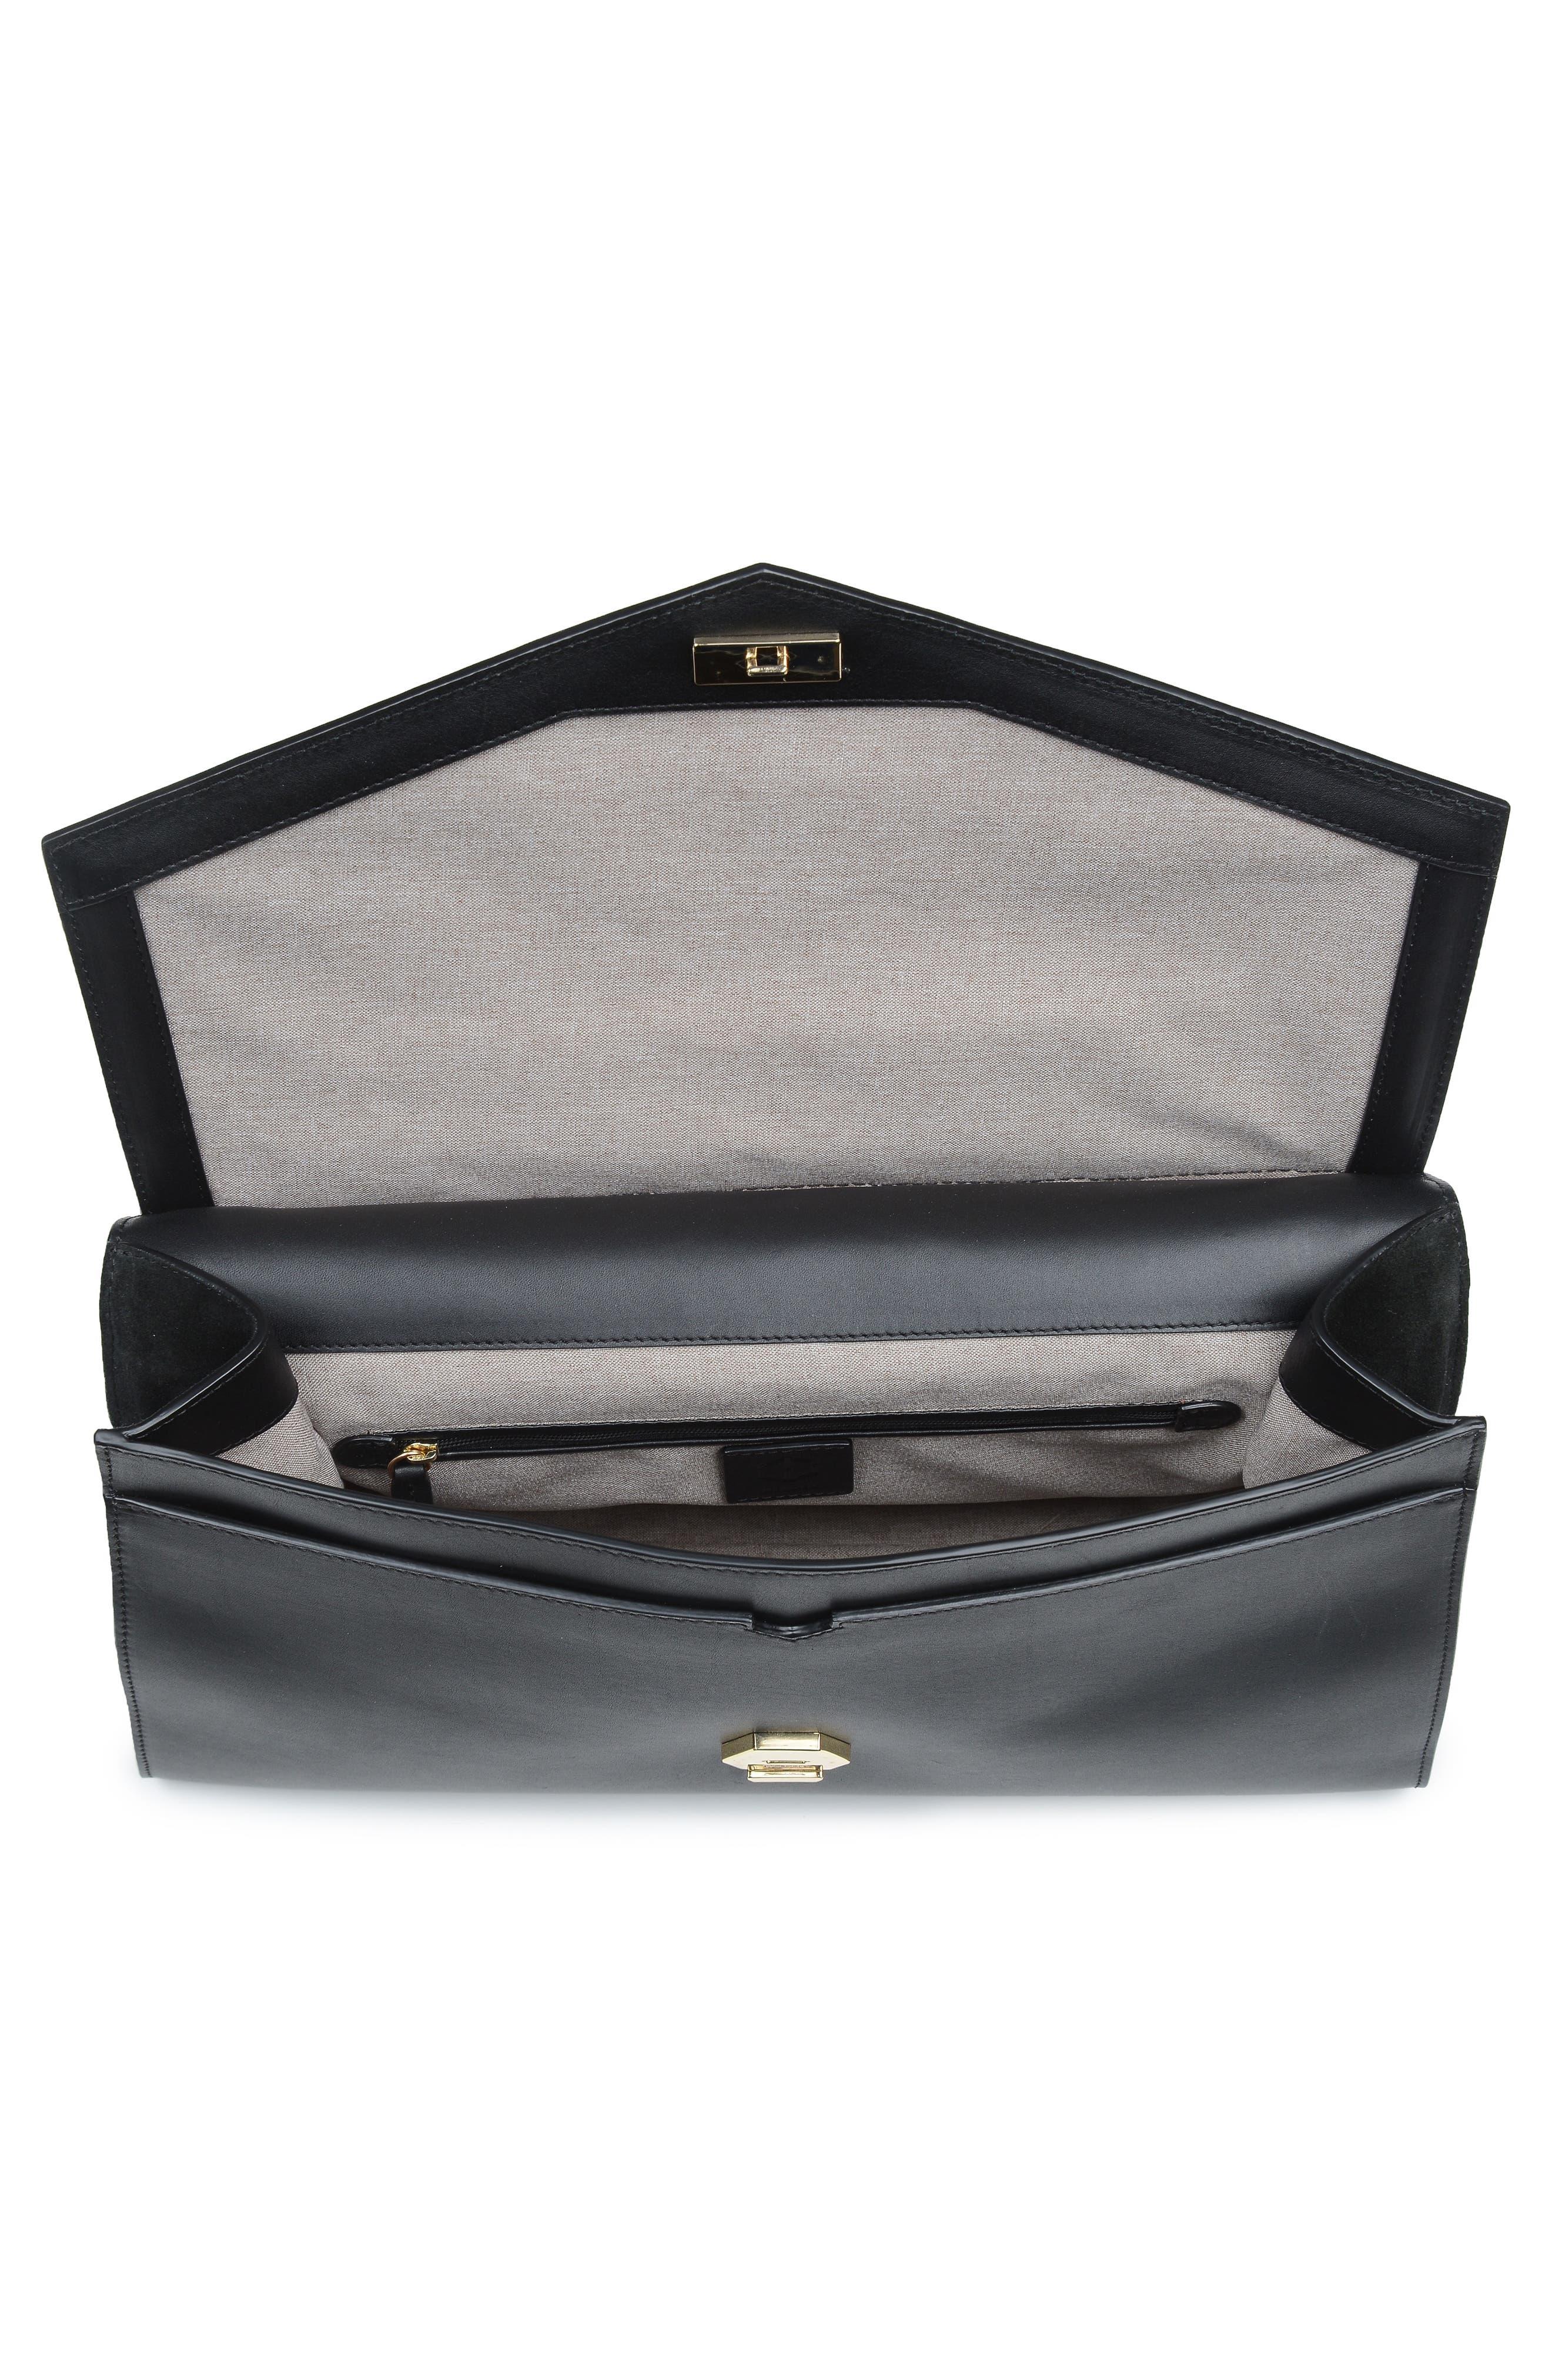 Wayfare Calfskin Leather Top Handle Satchel,                             Alternate thumbnail 3, color,                             BLACK